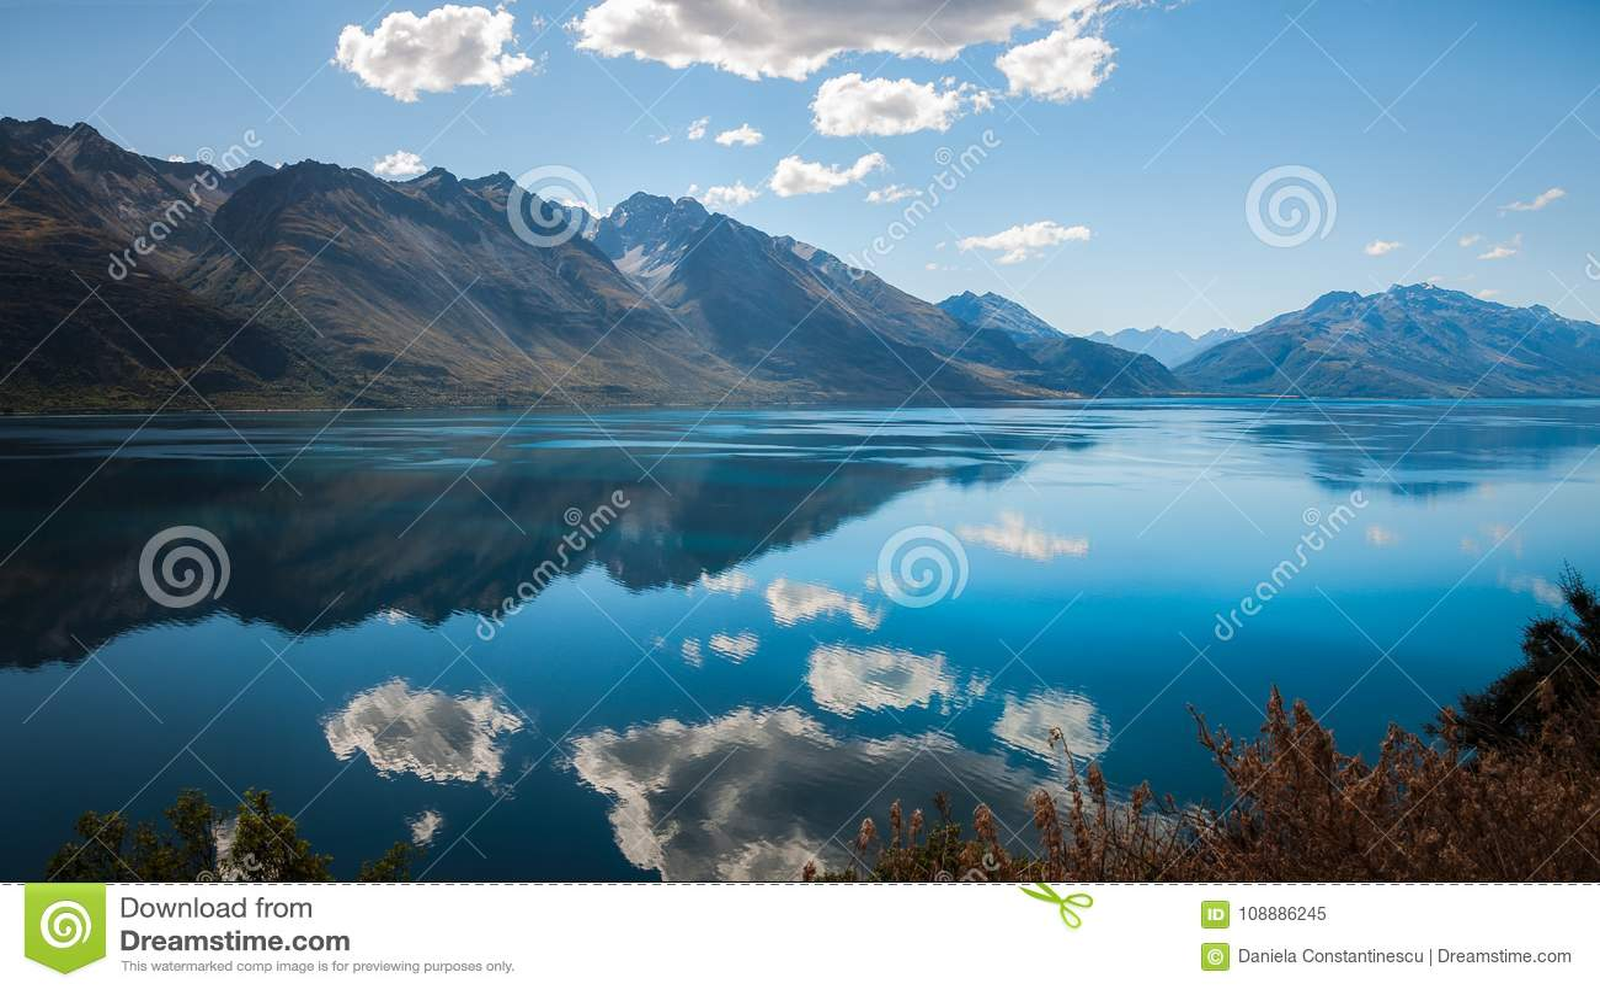 The blue waters of lake Wakatipu, New Zealand